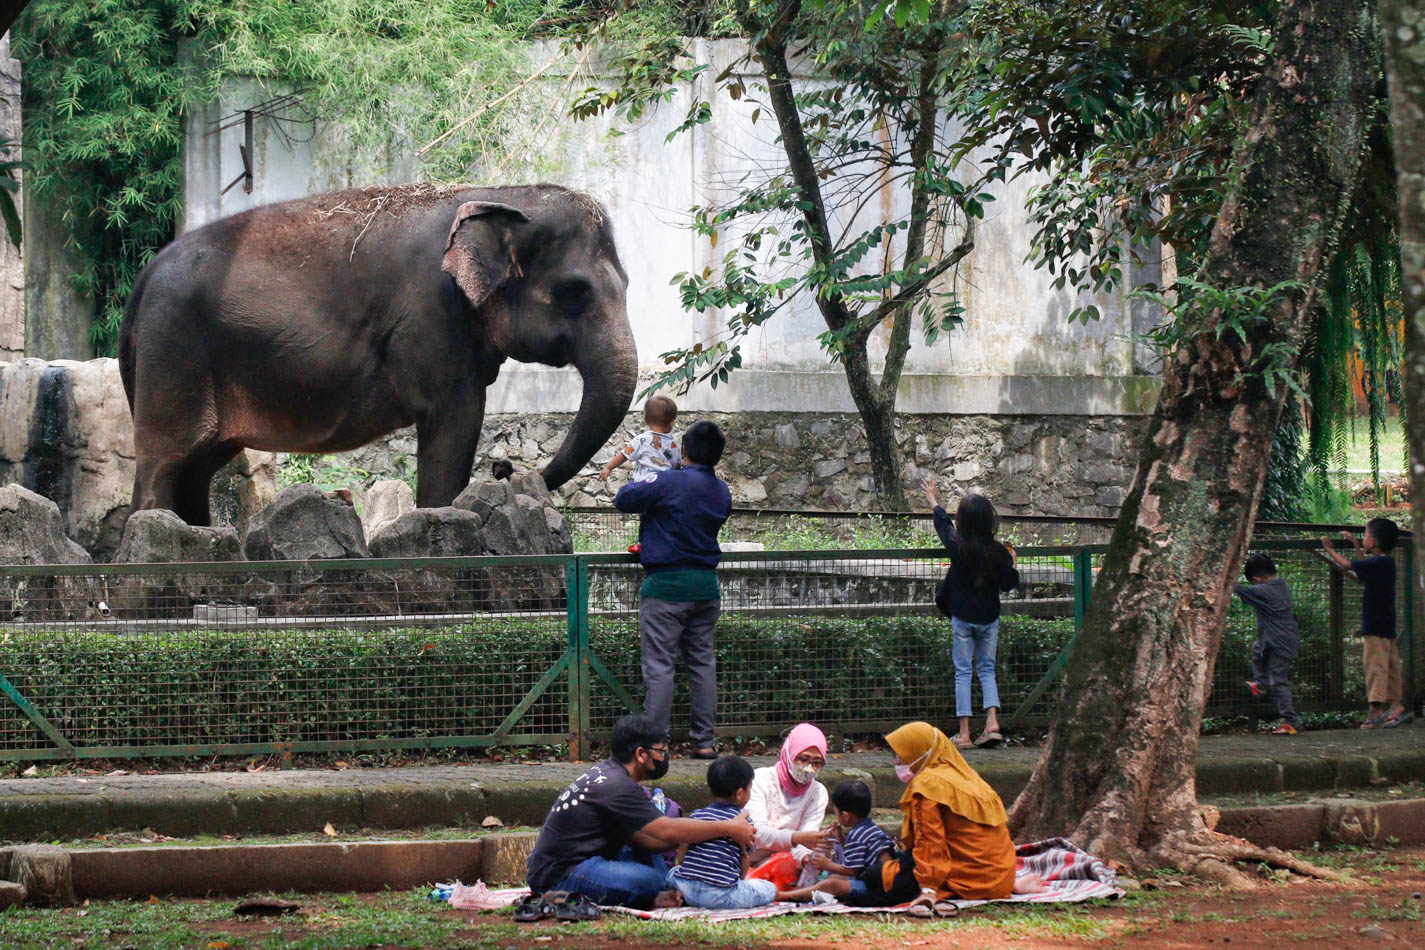 Taman Margasatwa Ragunan Kembali Dibuka untuk Warga Ber-KTP DKI Jakarta